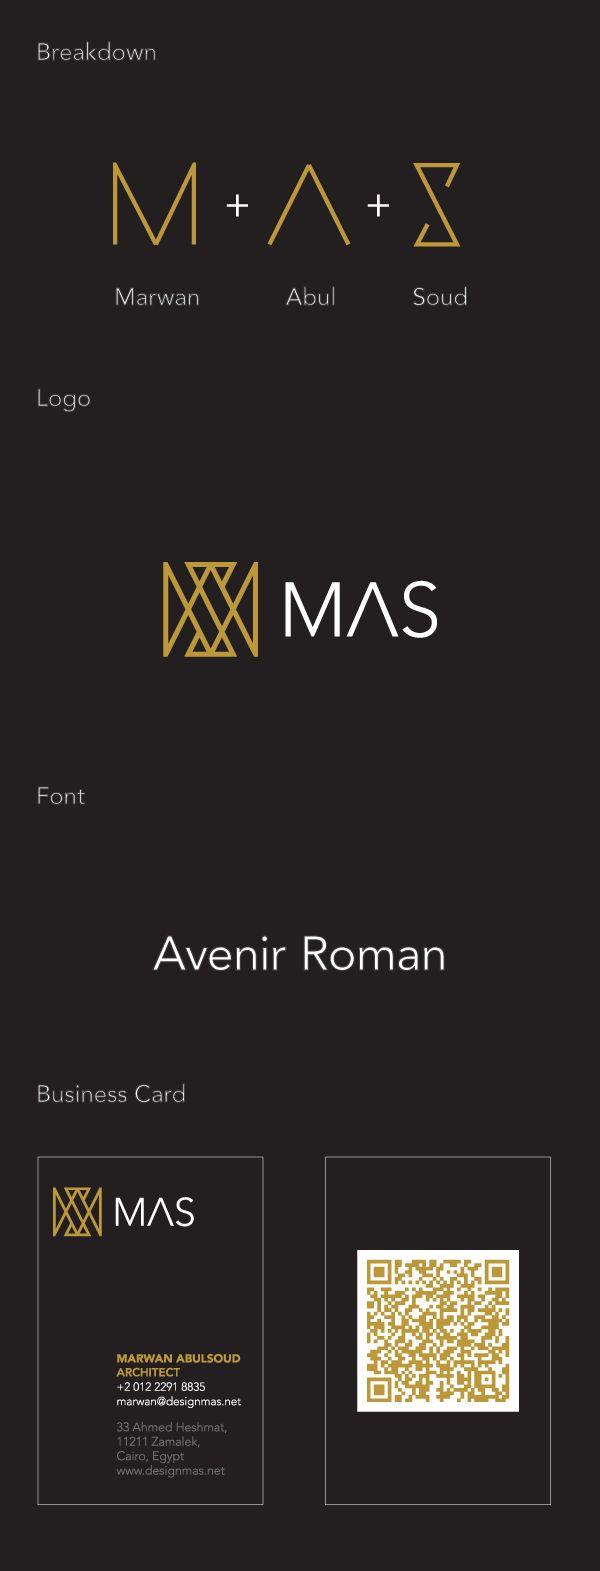 MAS | Identity by Islam Zayed, via Behance